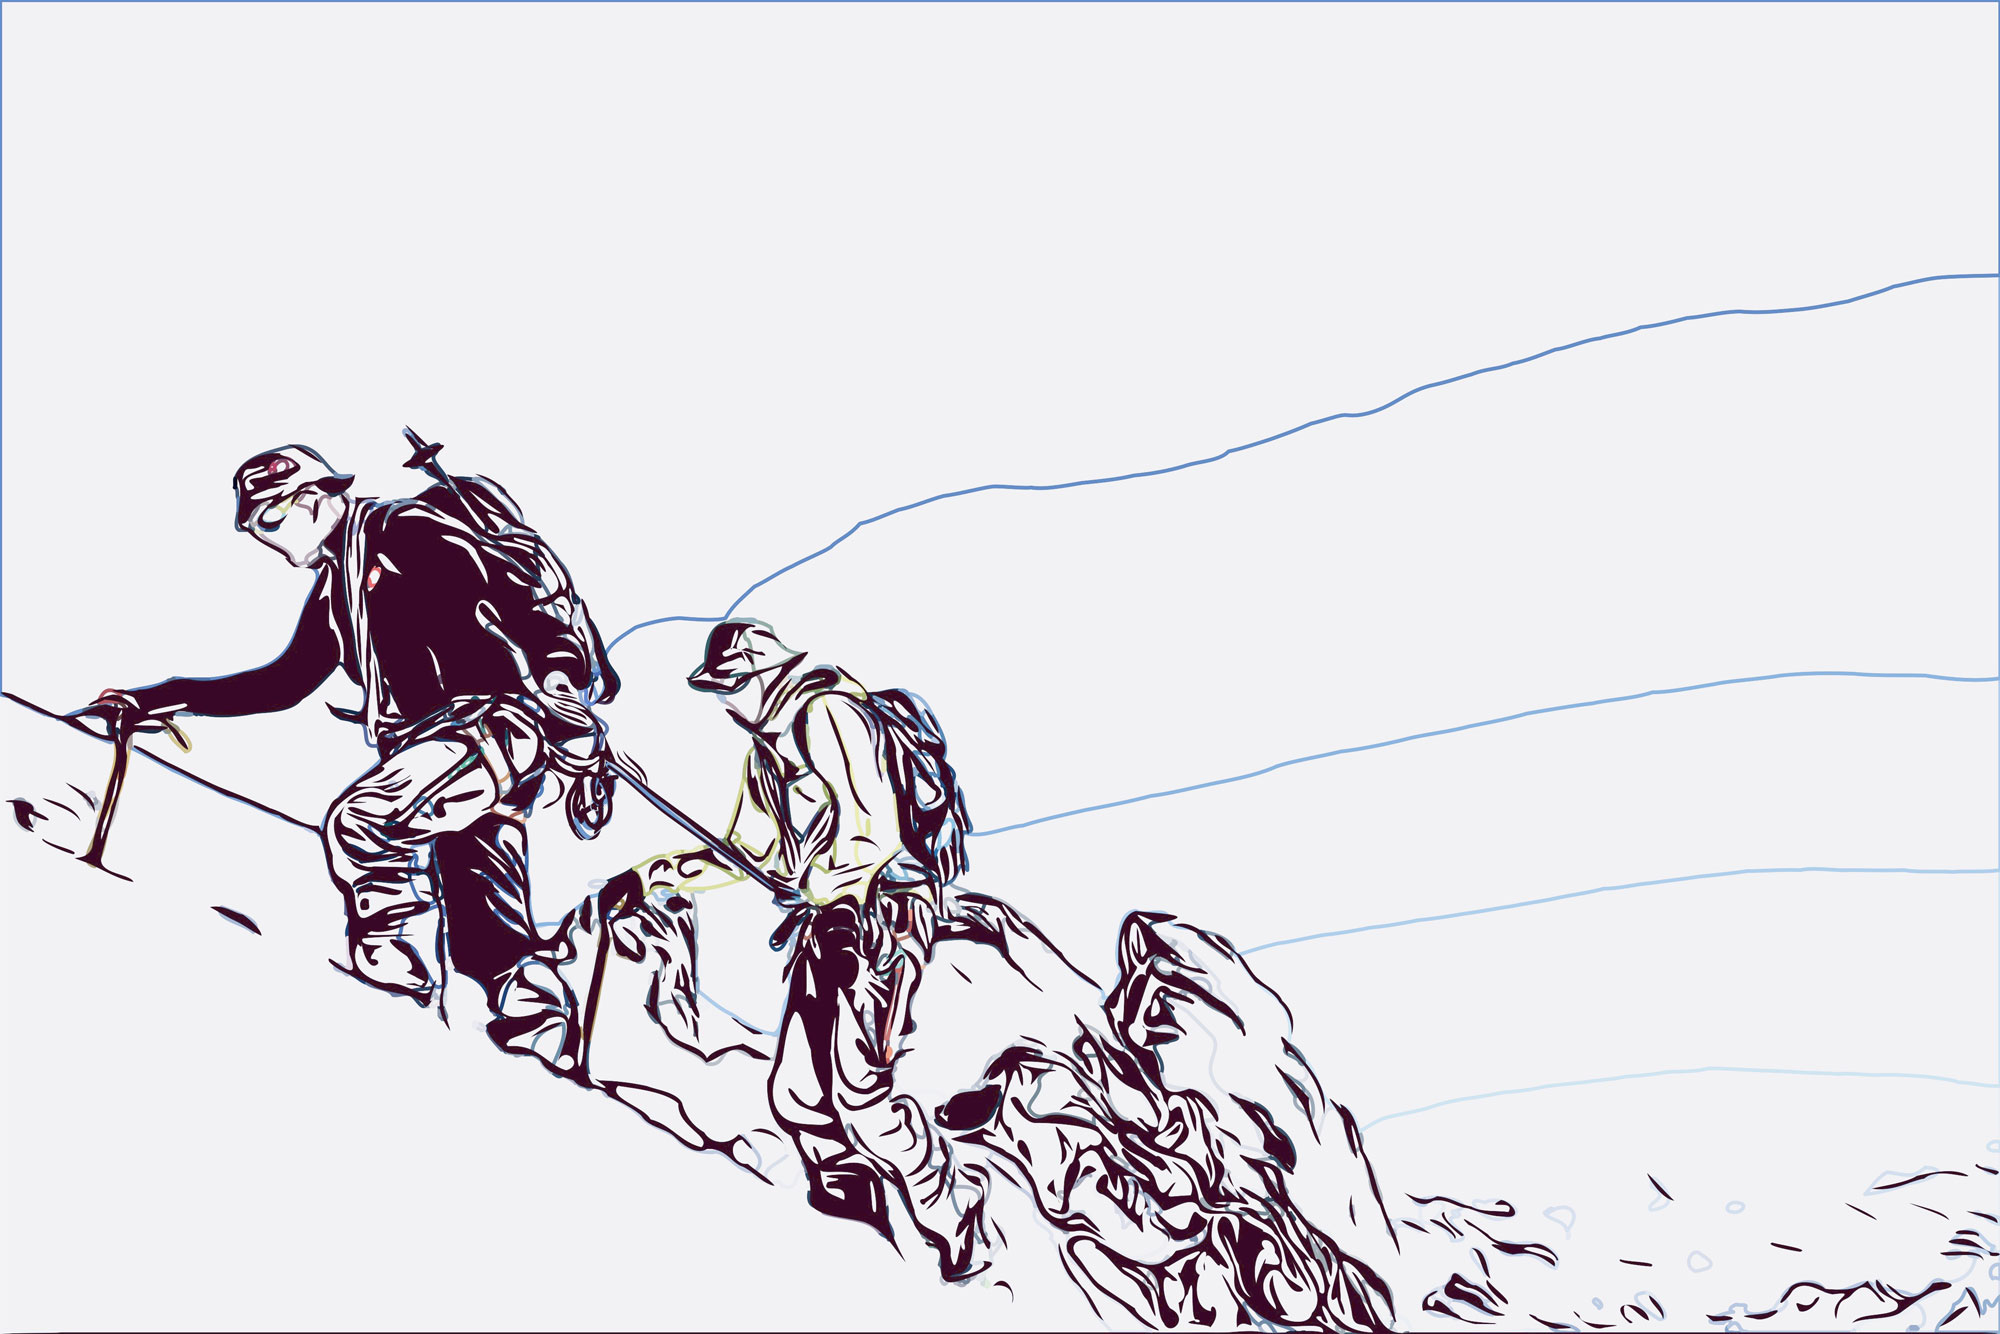 Kurz und schmerzlos, Gehen am kurzen Seil, © Argonaut.pro I bergundsteigen.blog